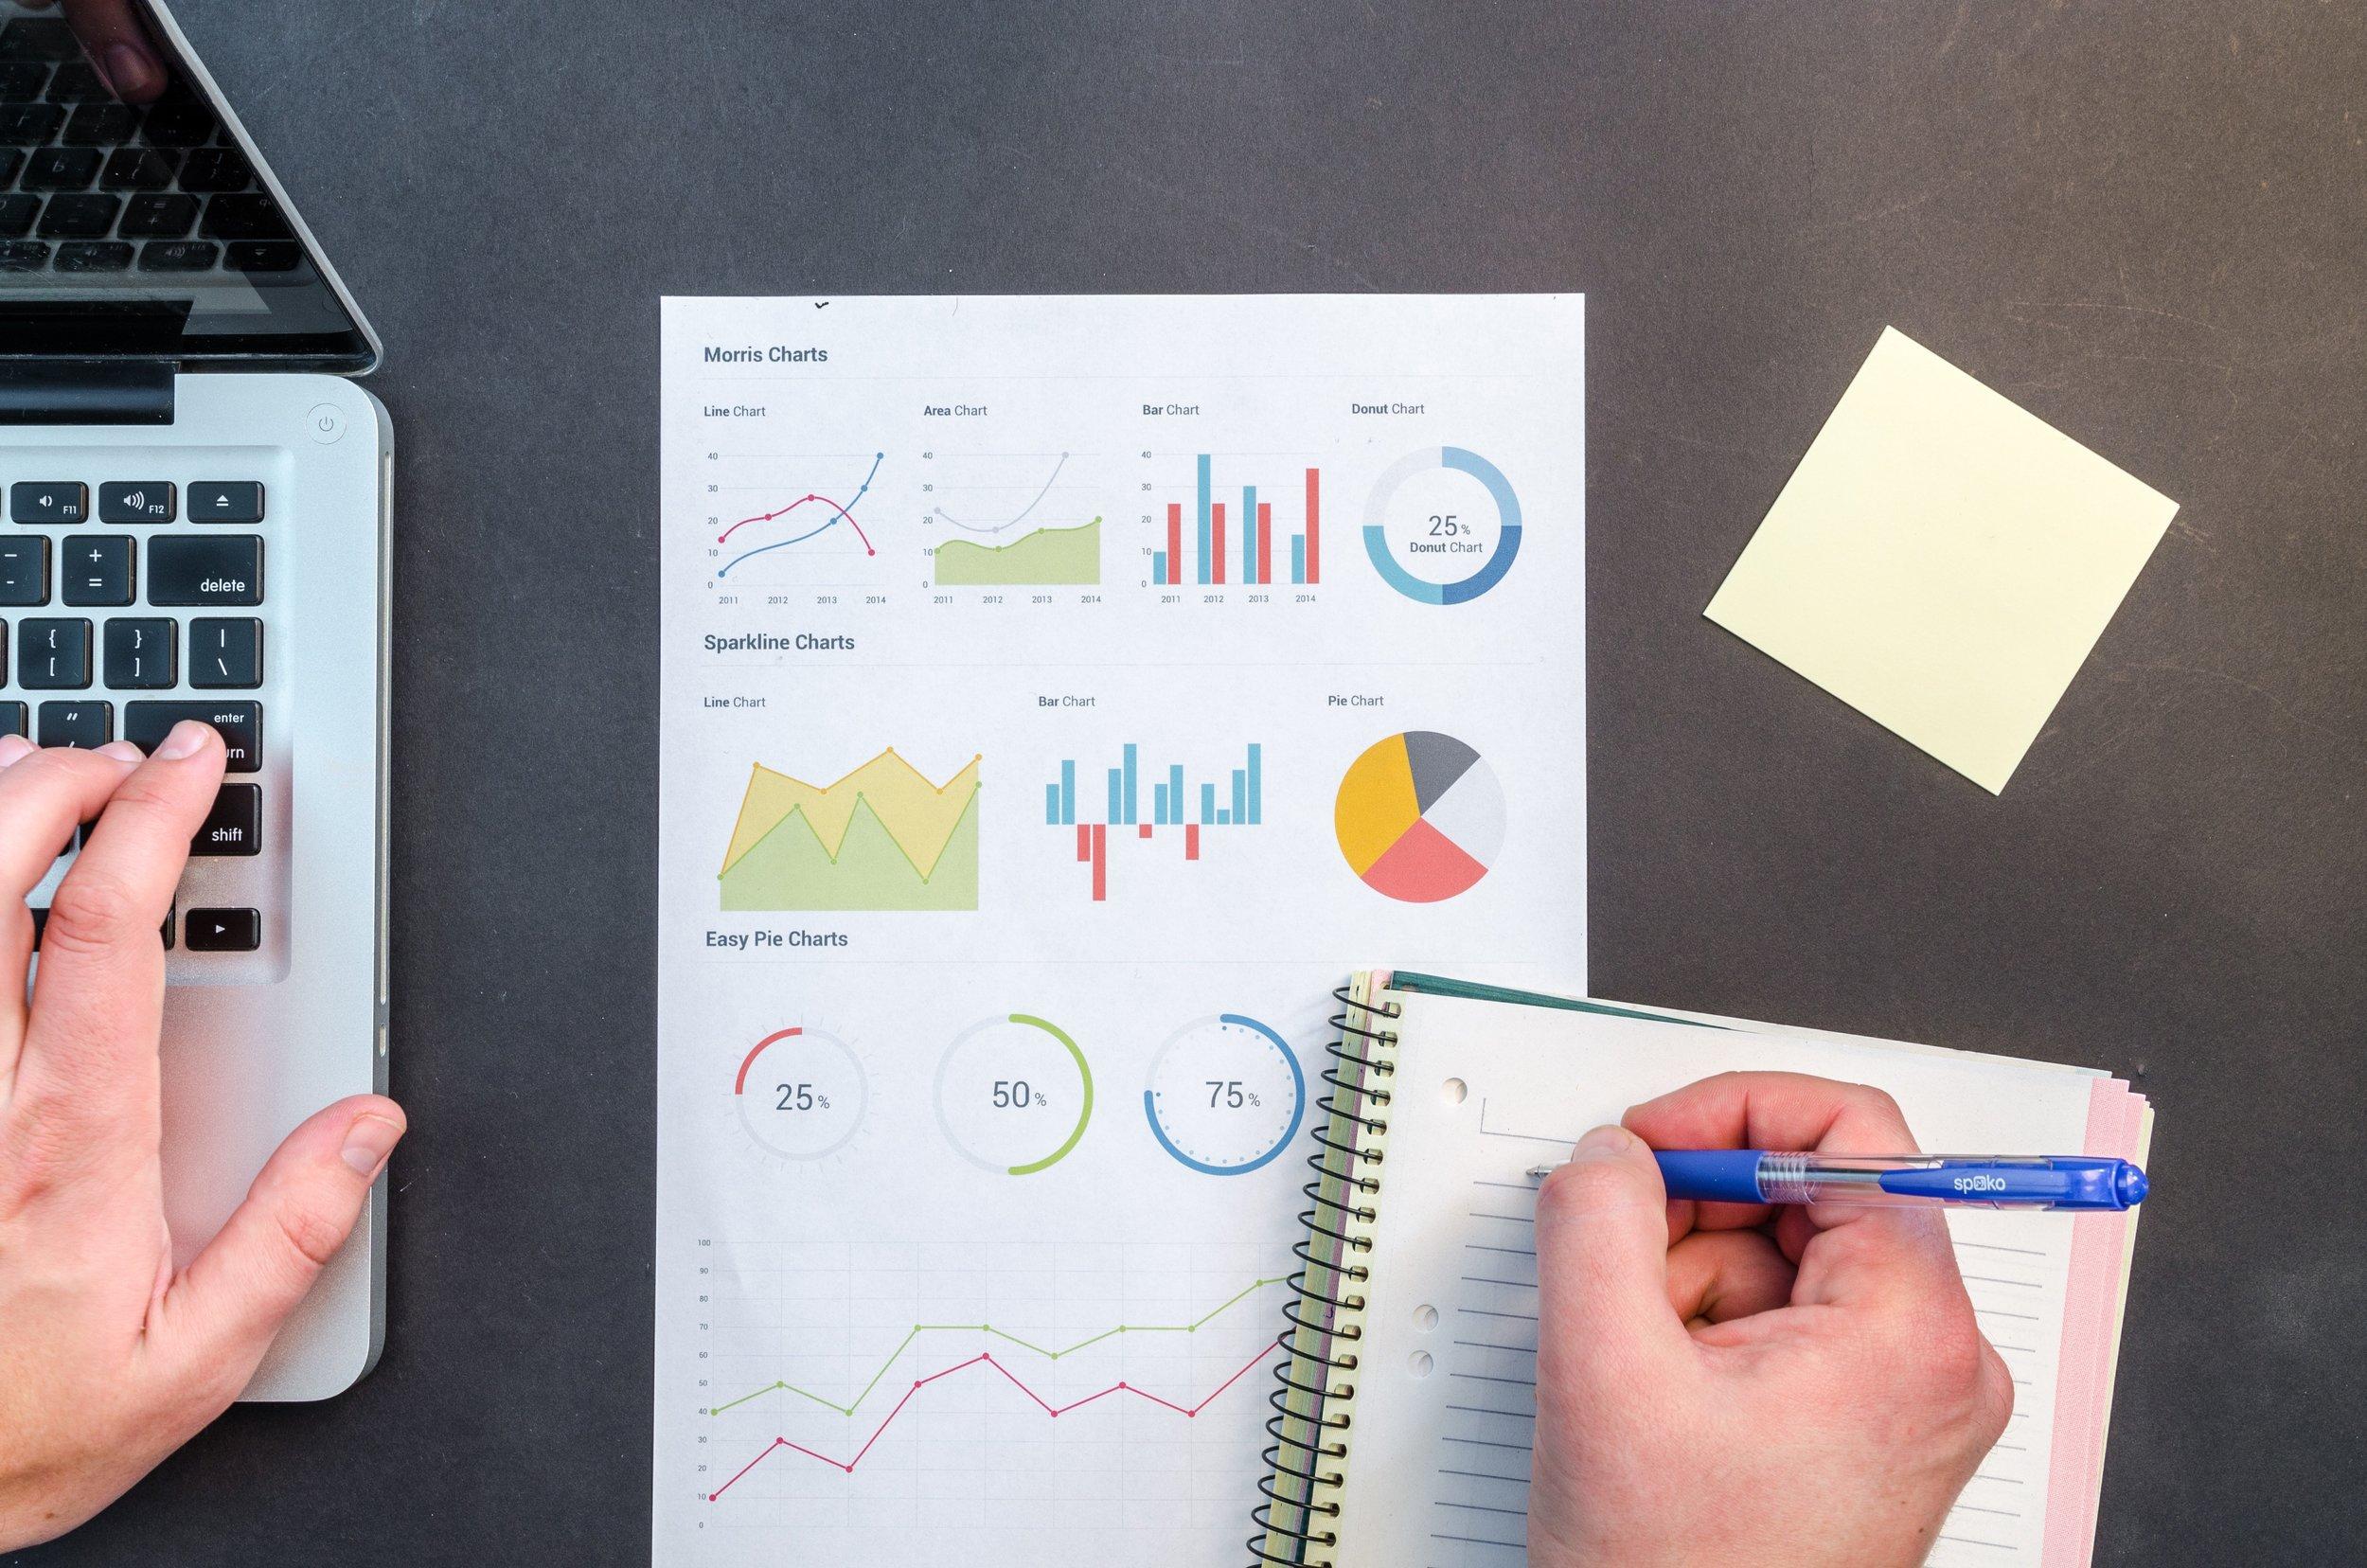 4. Videos help companies grow revenue faster -